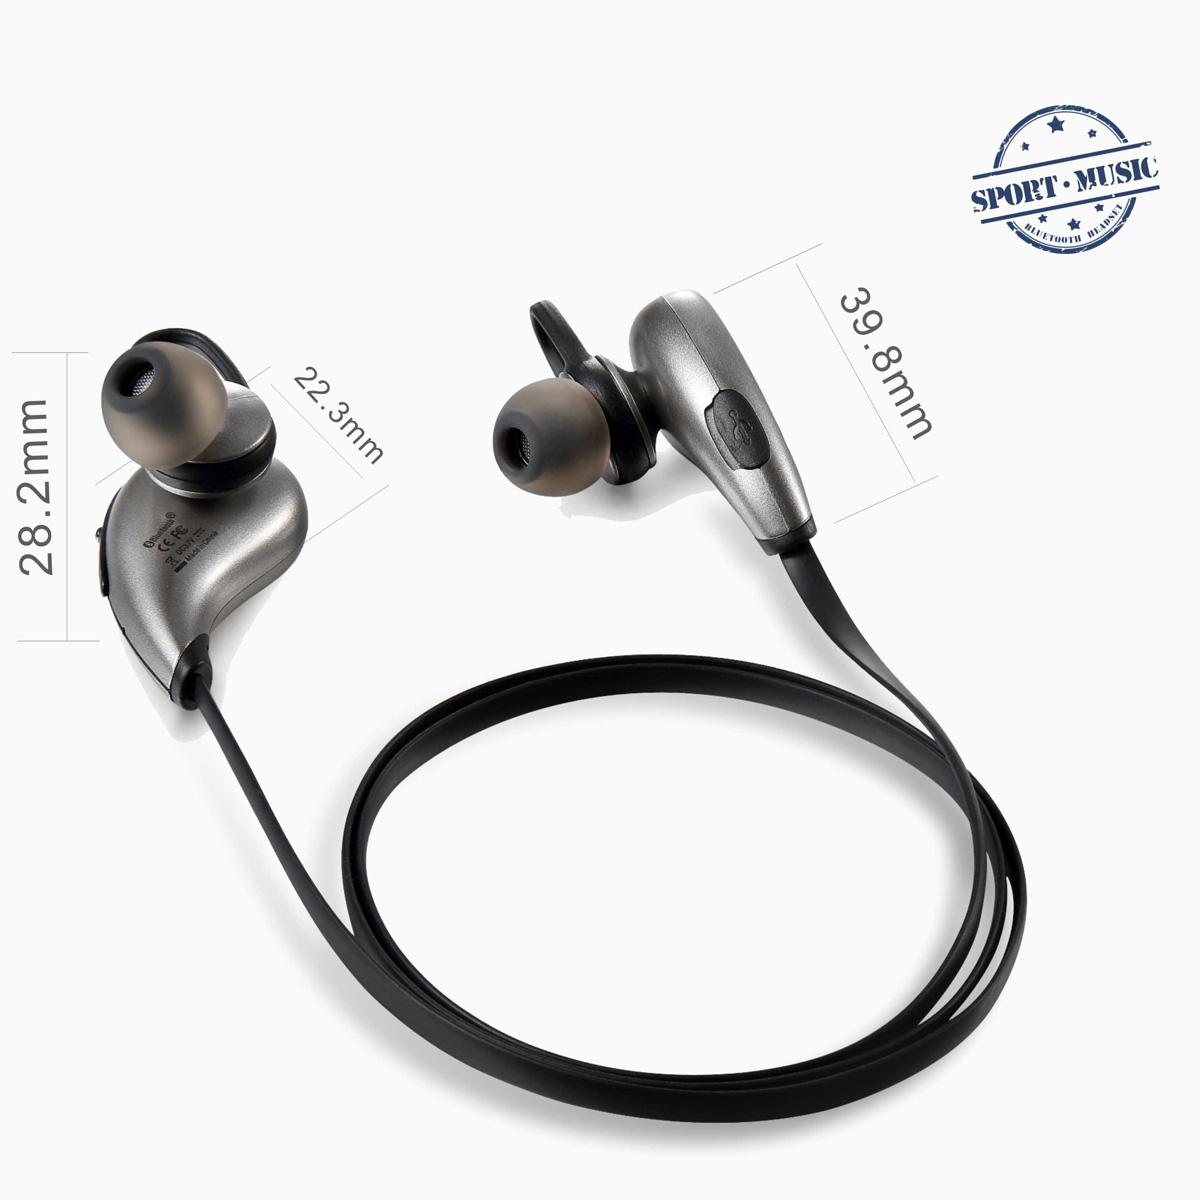 stereo bluetooth ohrh rer kopfh rer headset mit mikrofon f r handy sport halle ebay. Black Bedroom Furniture Sets. Home Design Ideas